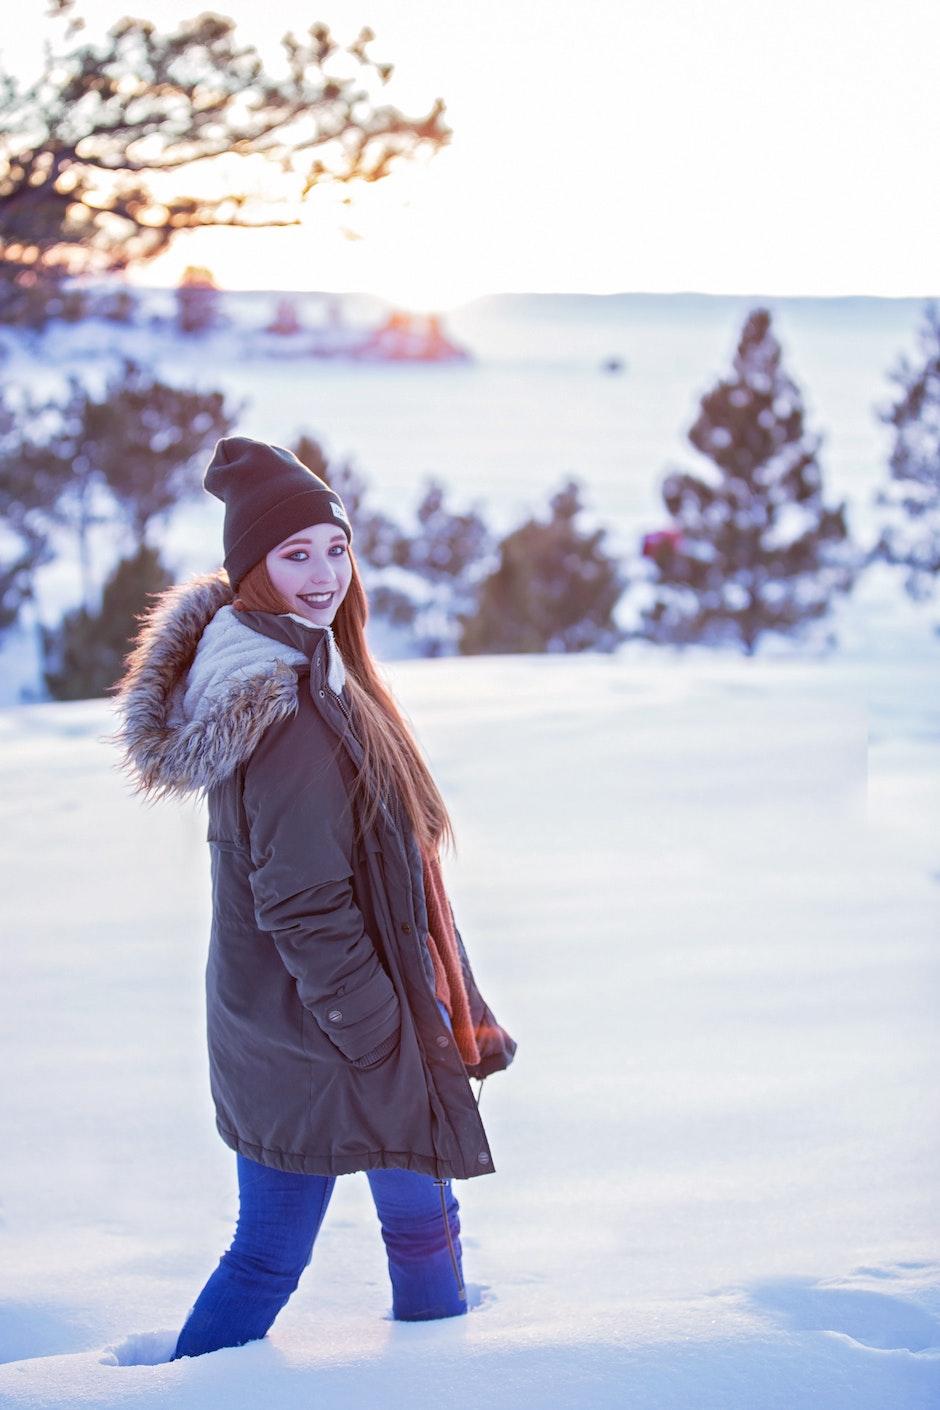 blur, cold, cool